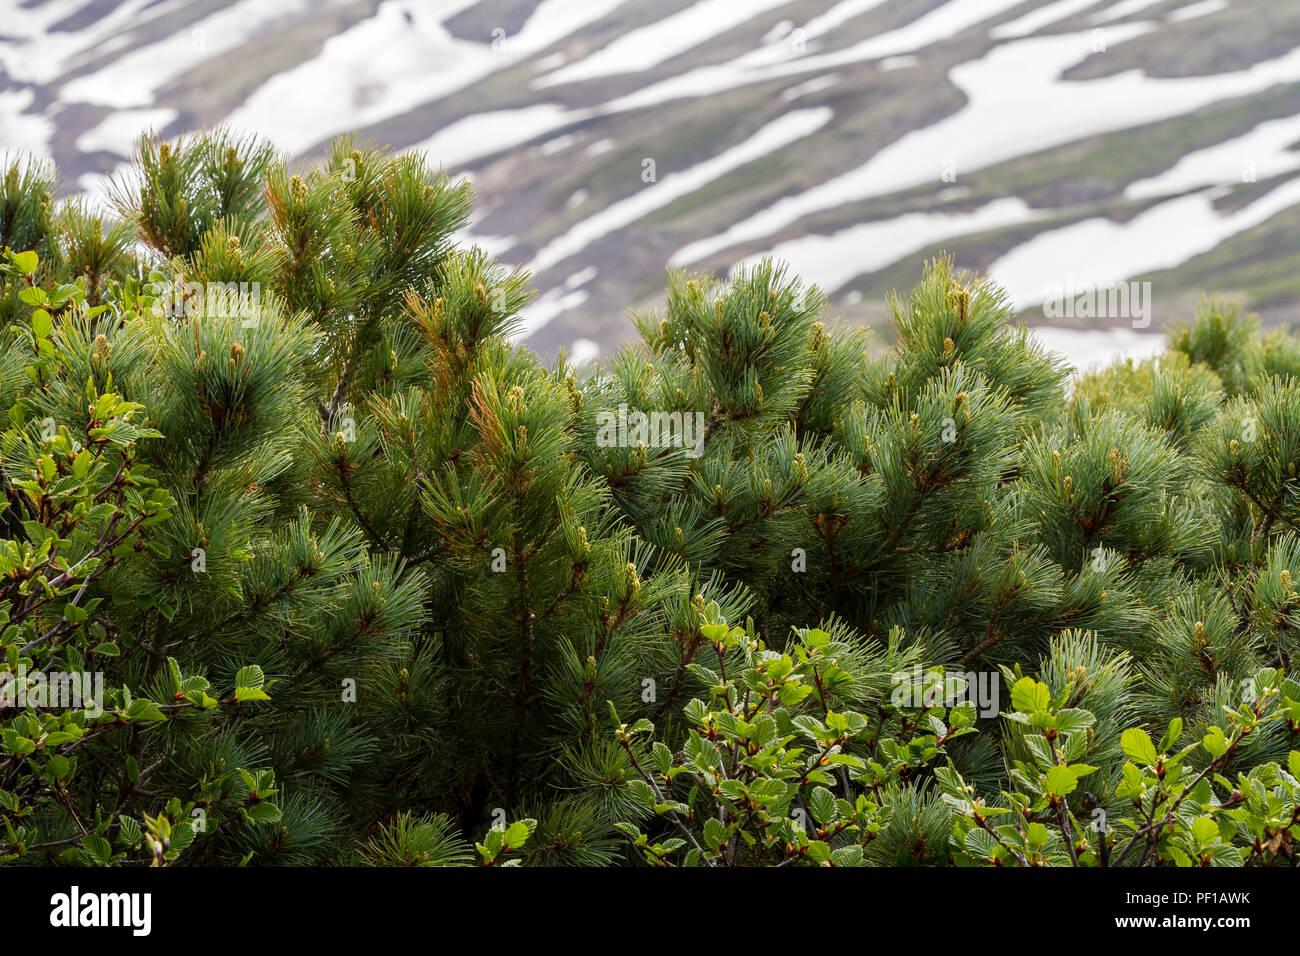 Cedar (Pinus pumila) growing near snow capped mountain. Kamchatka Peninsula, Russia - Stock Image